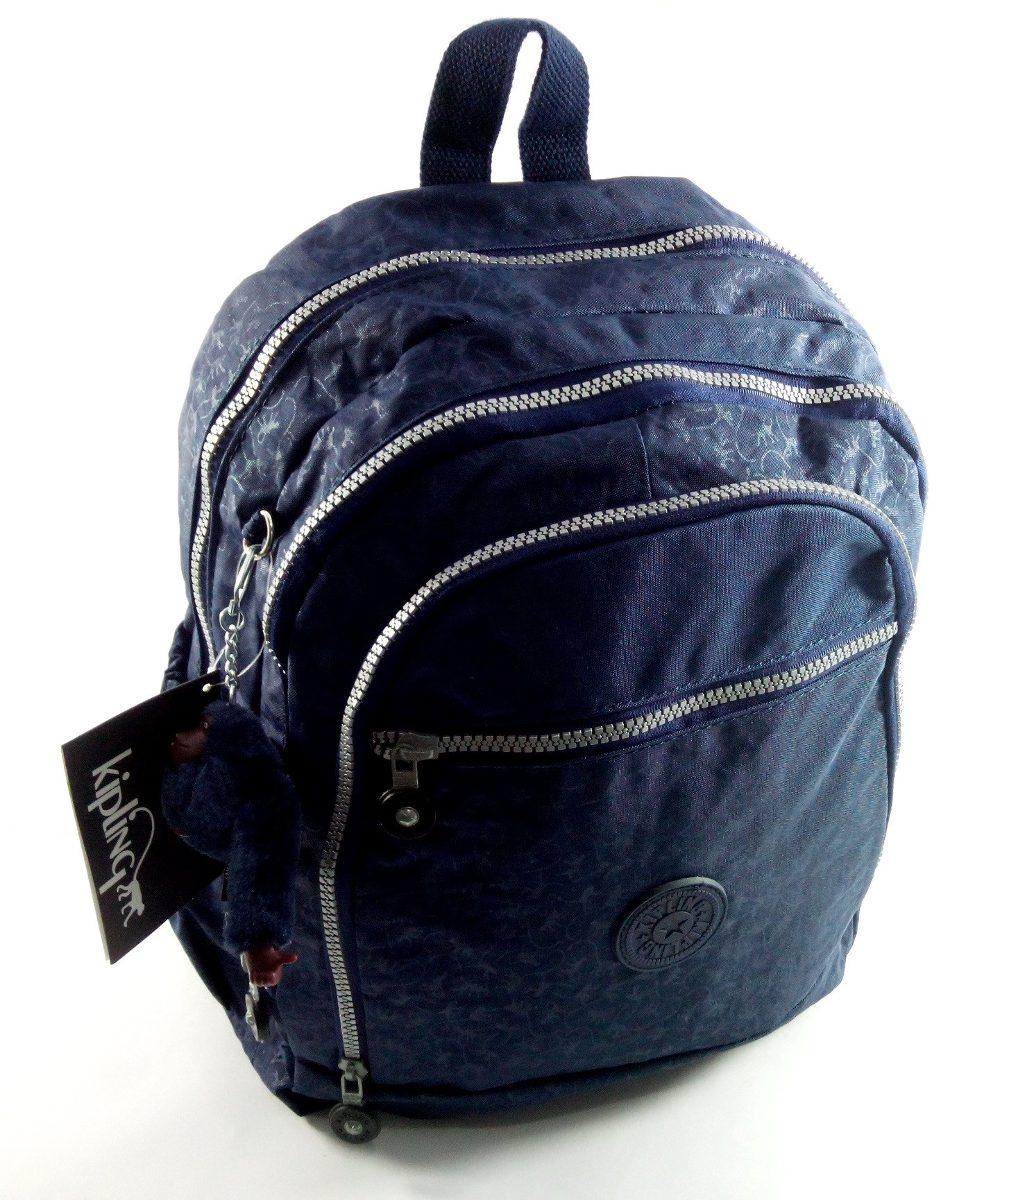 9f819c624 Mochila Kipling Jaque - R$ 195,00 em Mercado Livre